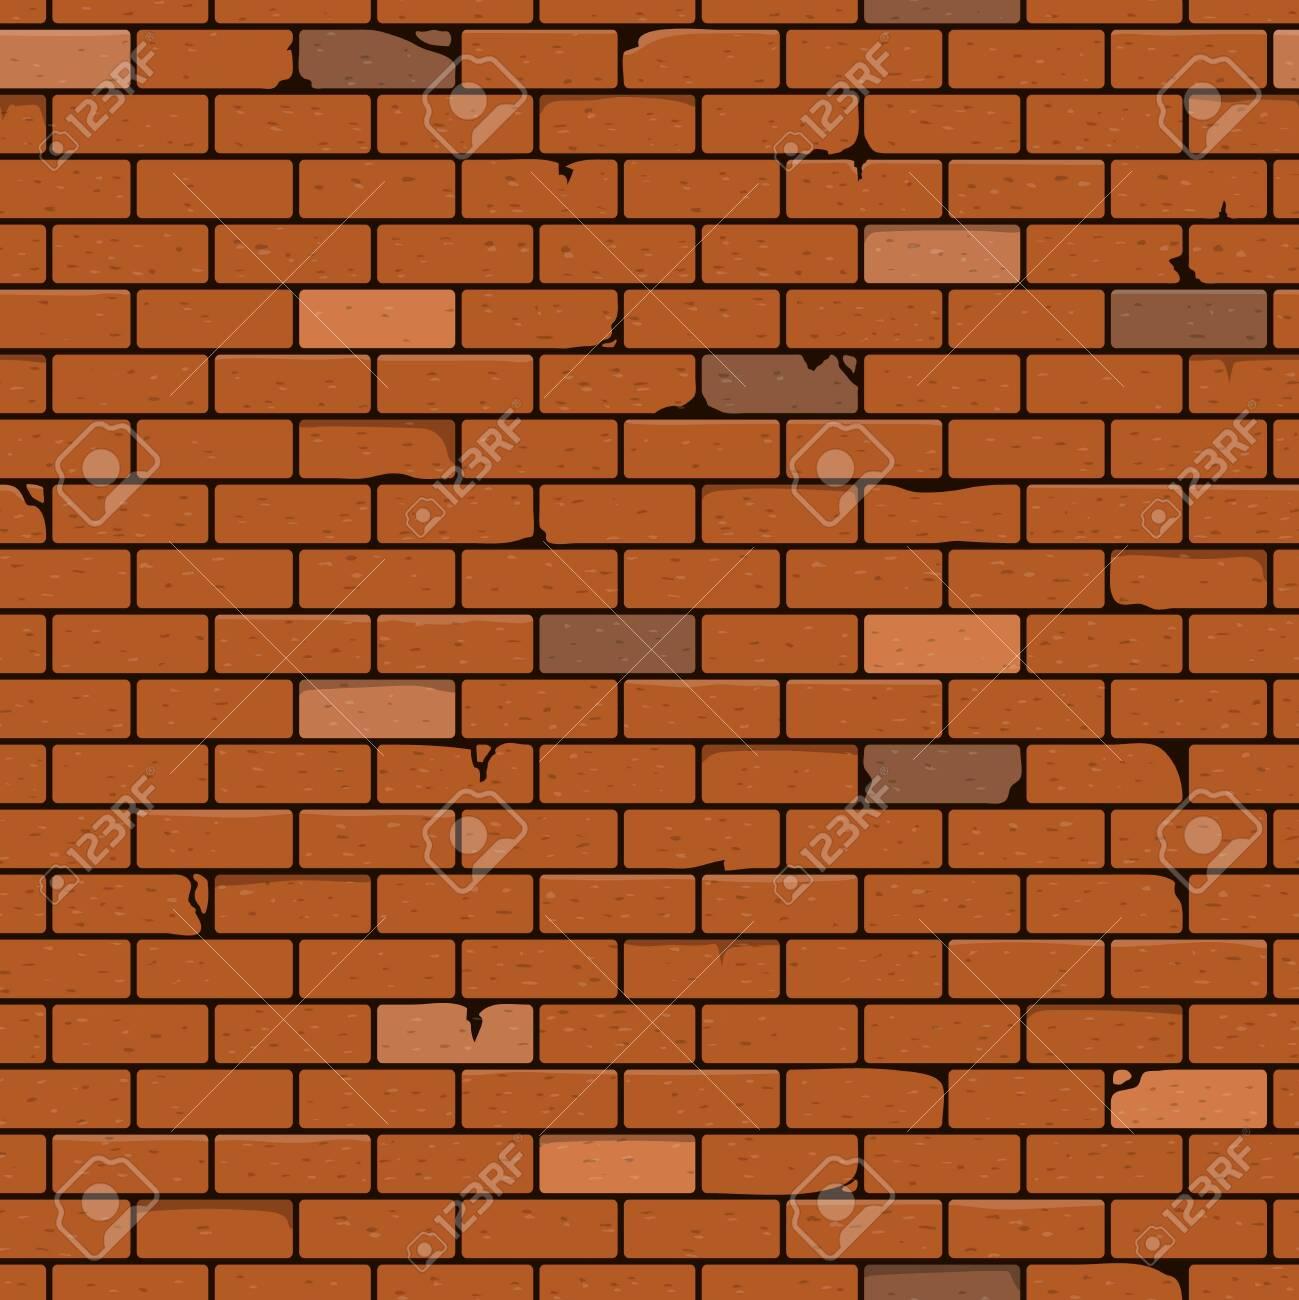 Brick Wall Seamless Pattern Background. Vector Illustration. - 149269238